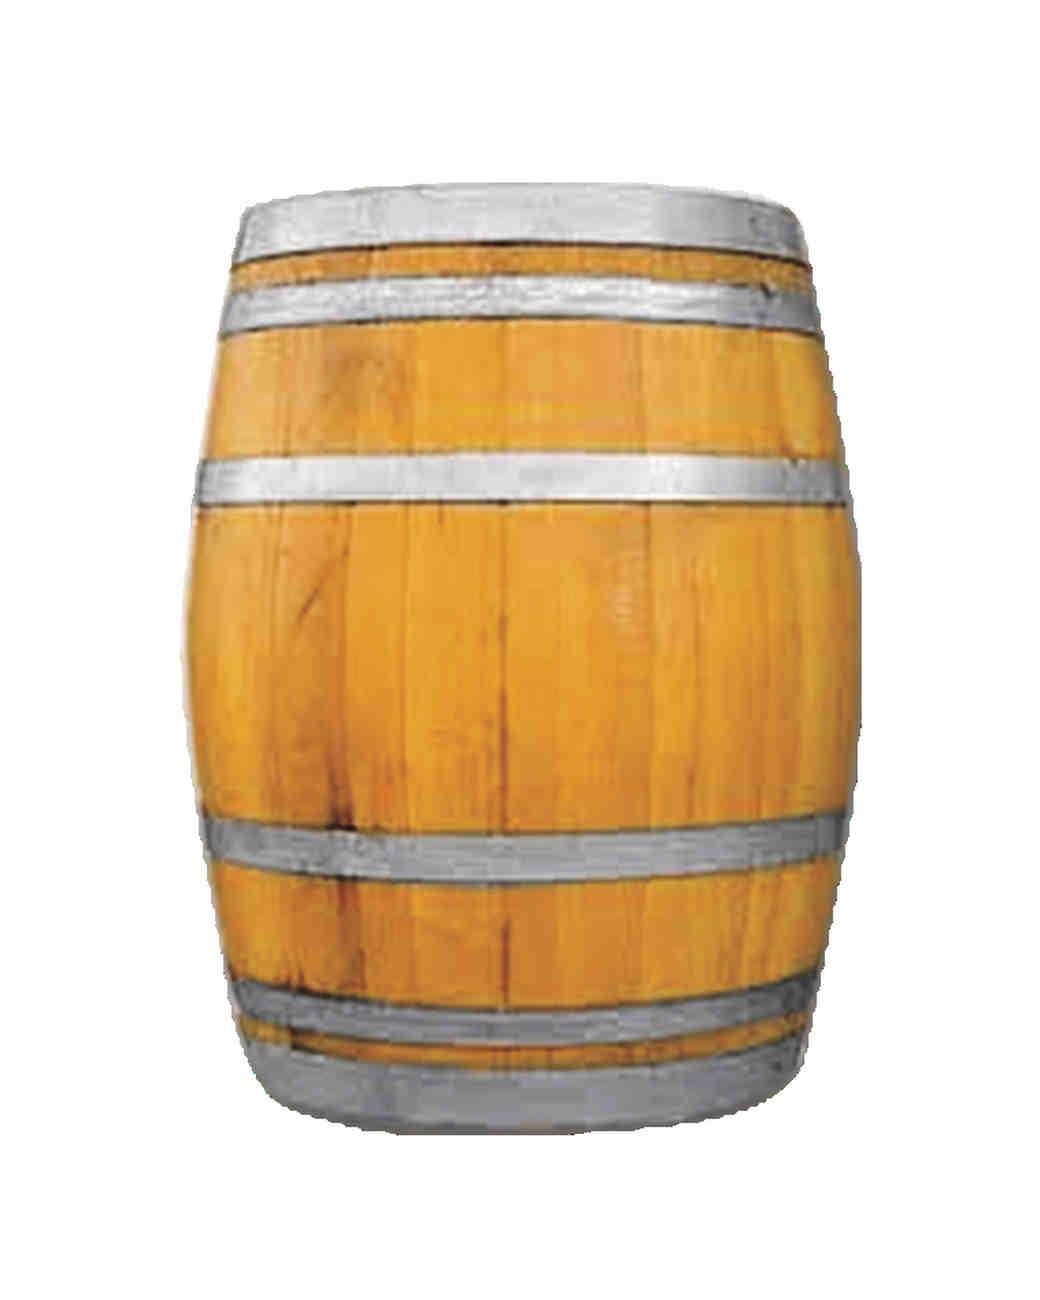 barrell-tn-1200-d7b40f3495dfe579aae9c60d324fbd3c-s112402.jpg..jpg